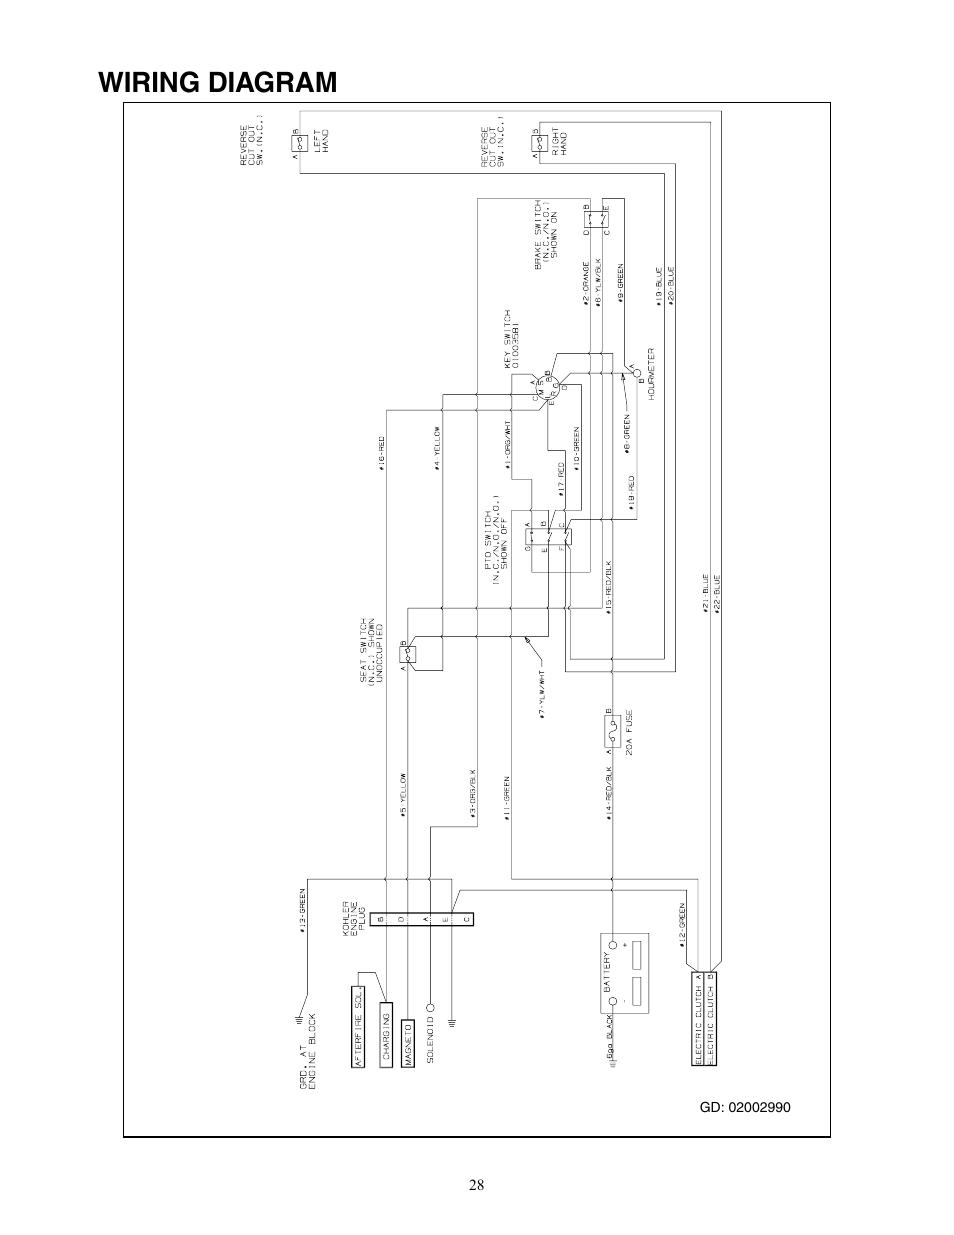 medium resolution of cub cadet z force 44 wiring diagram